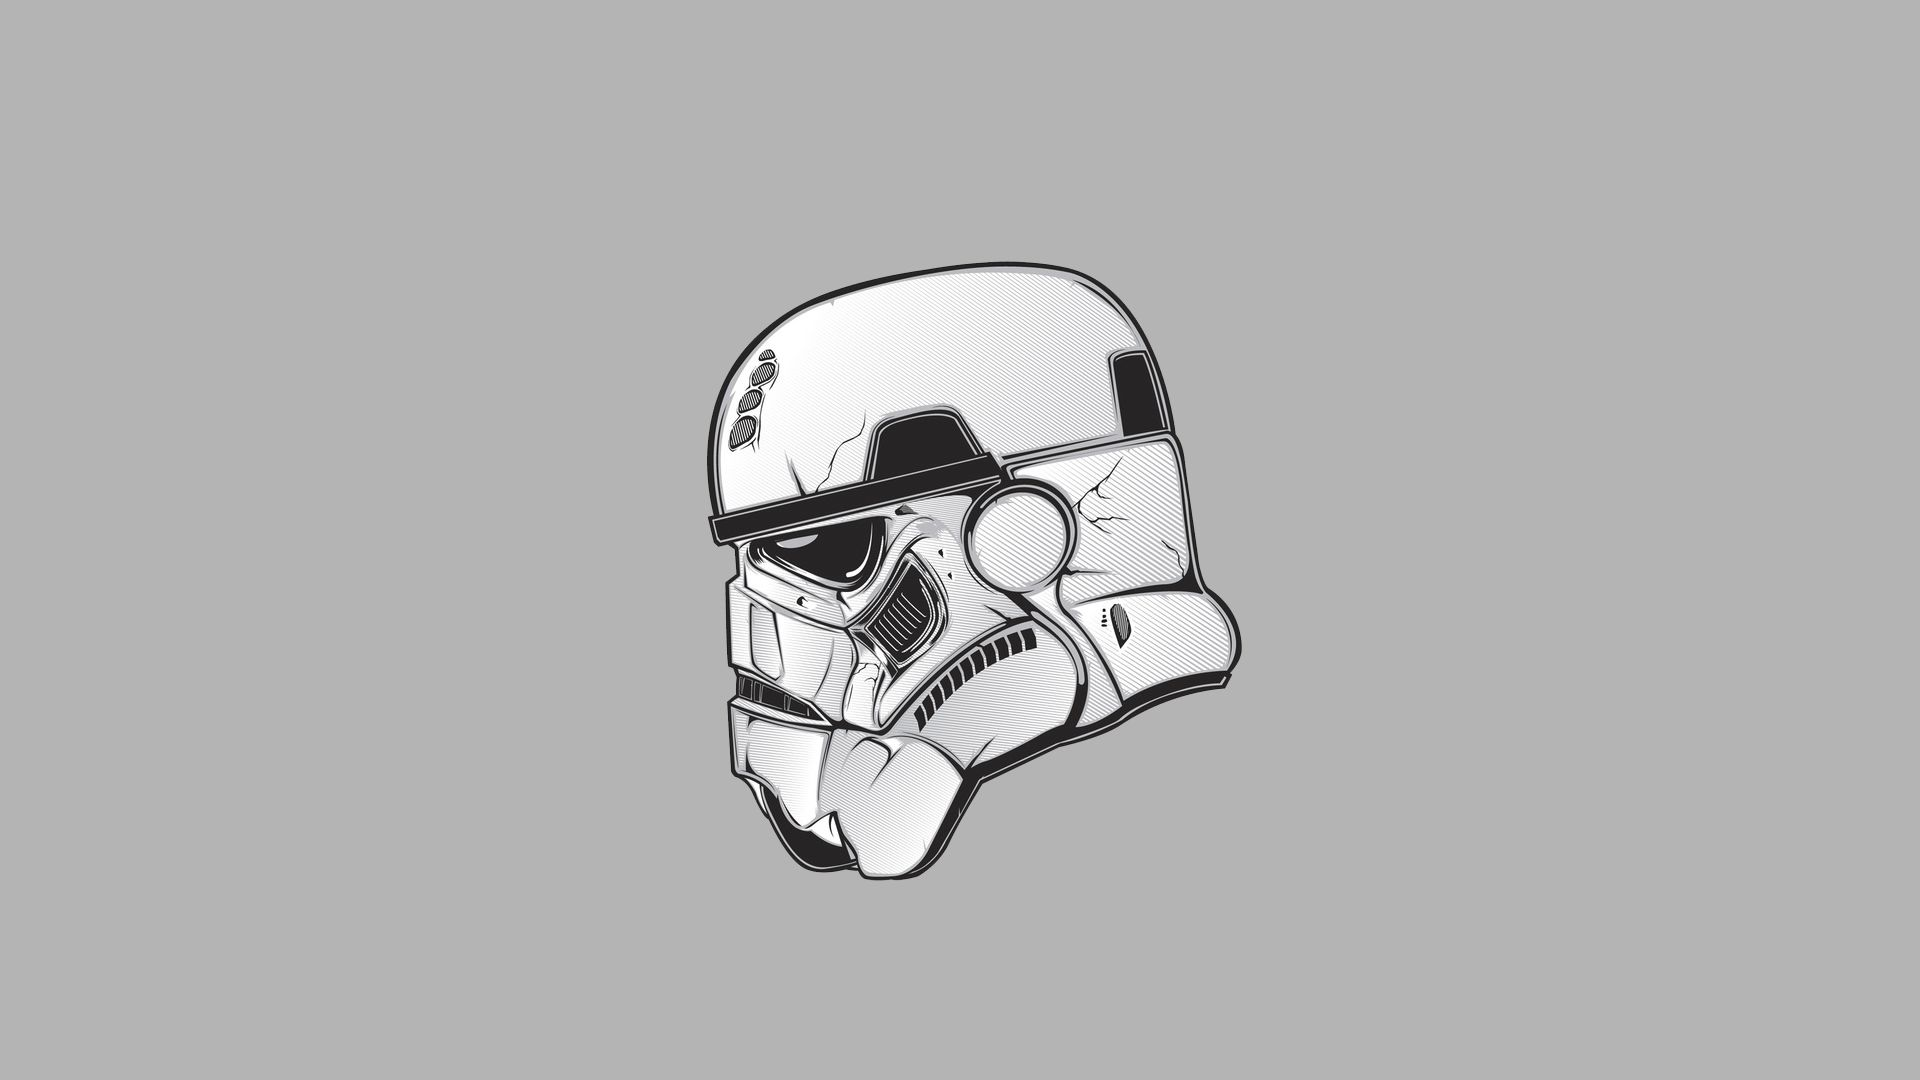 Star Wars Minimalist Picture